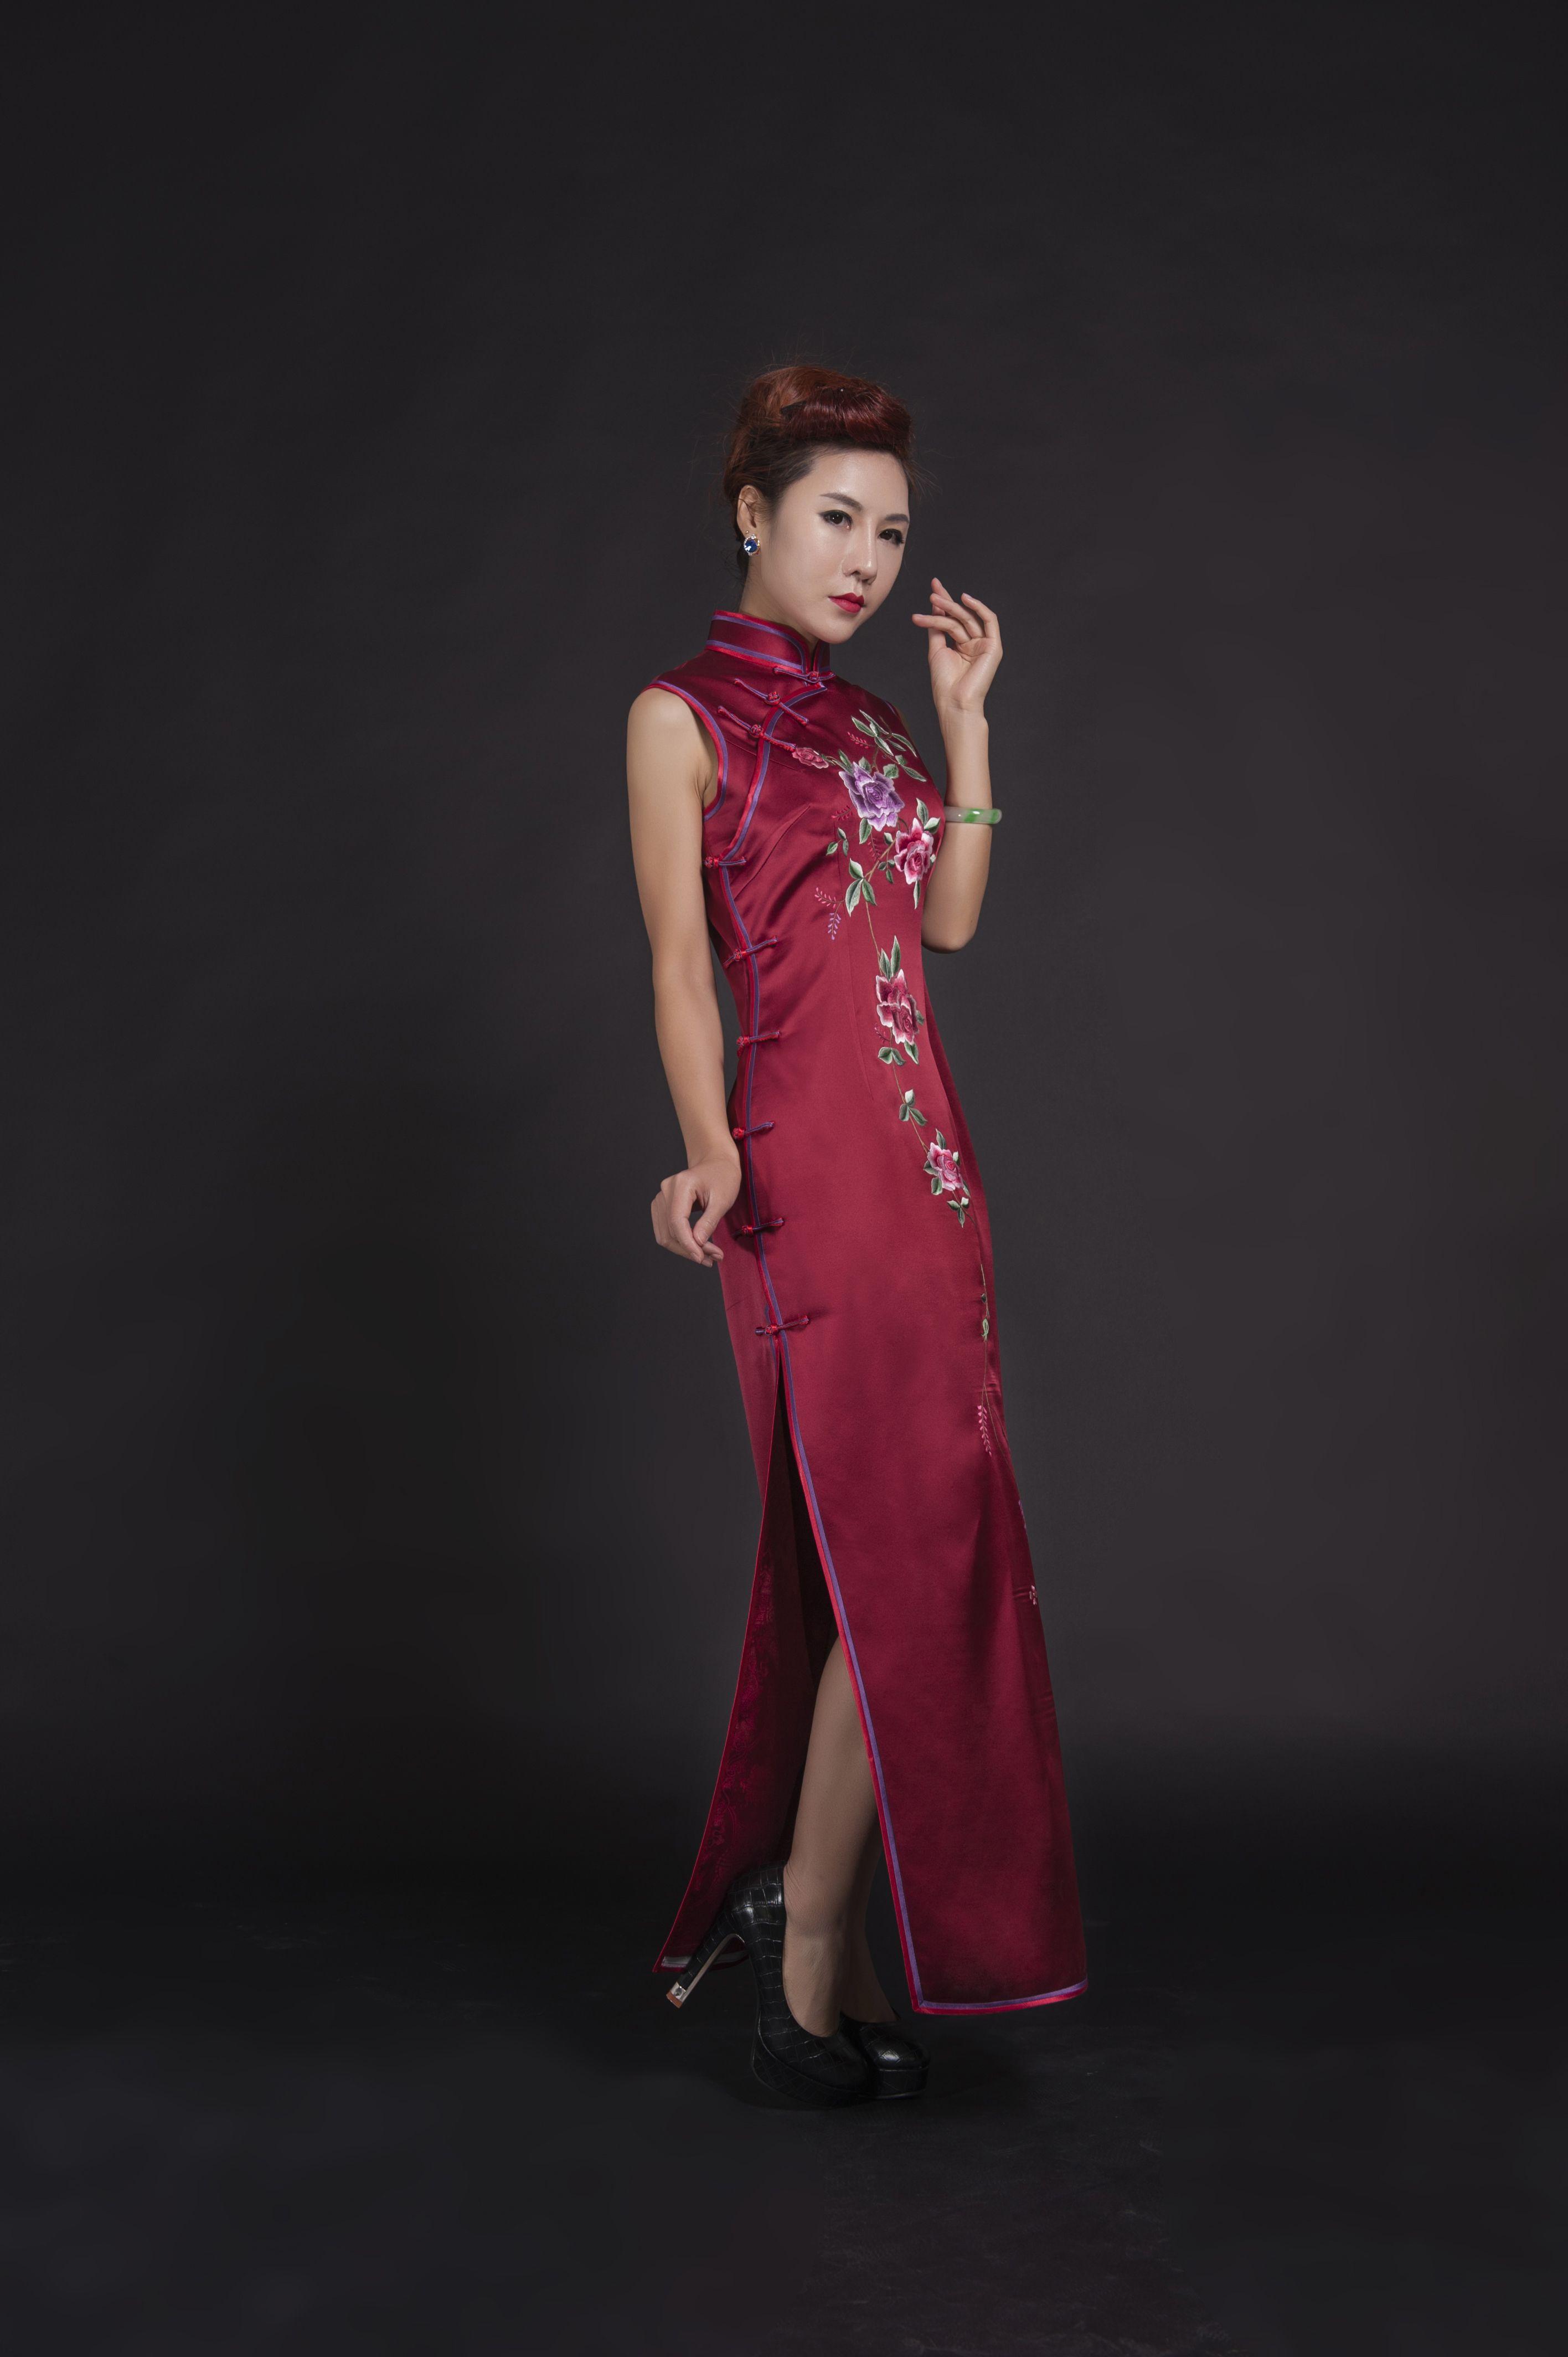 Cheongsam Qipao Modern Fashionable Qipao Modern Fashion Formal Dresses [ 4256 x 2832 Pixel ]